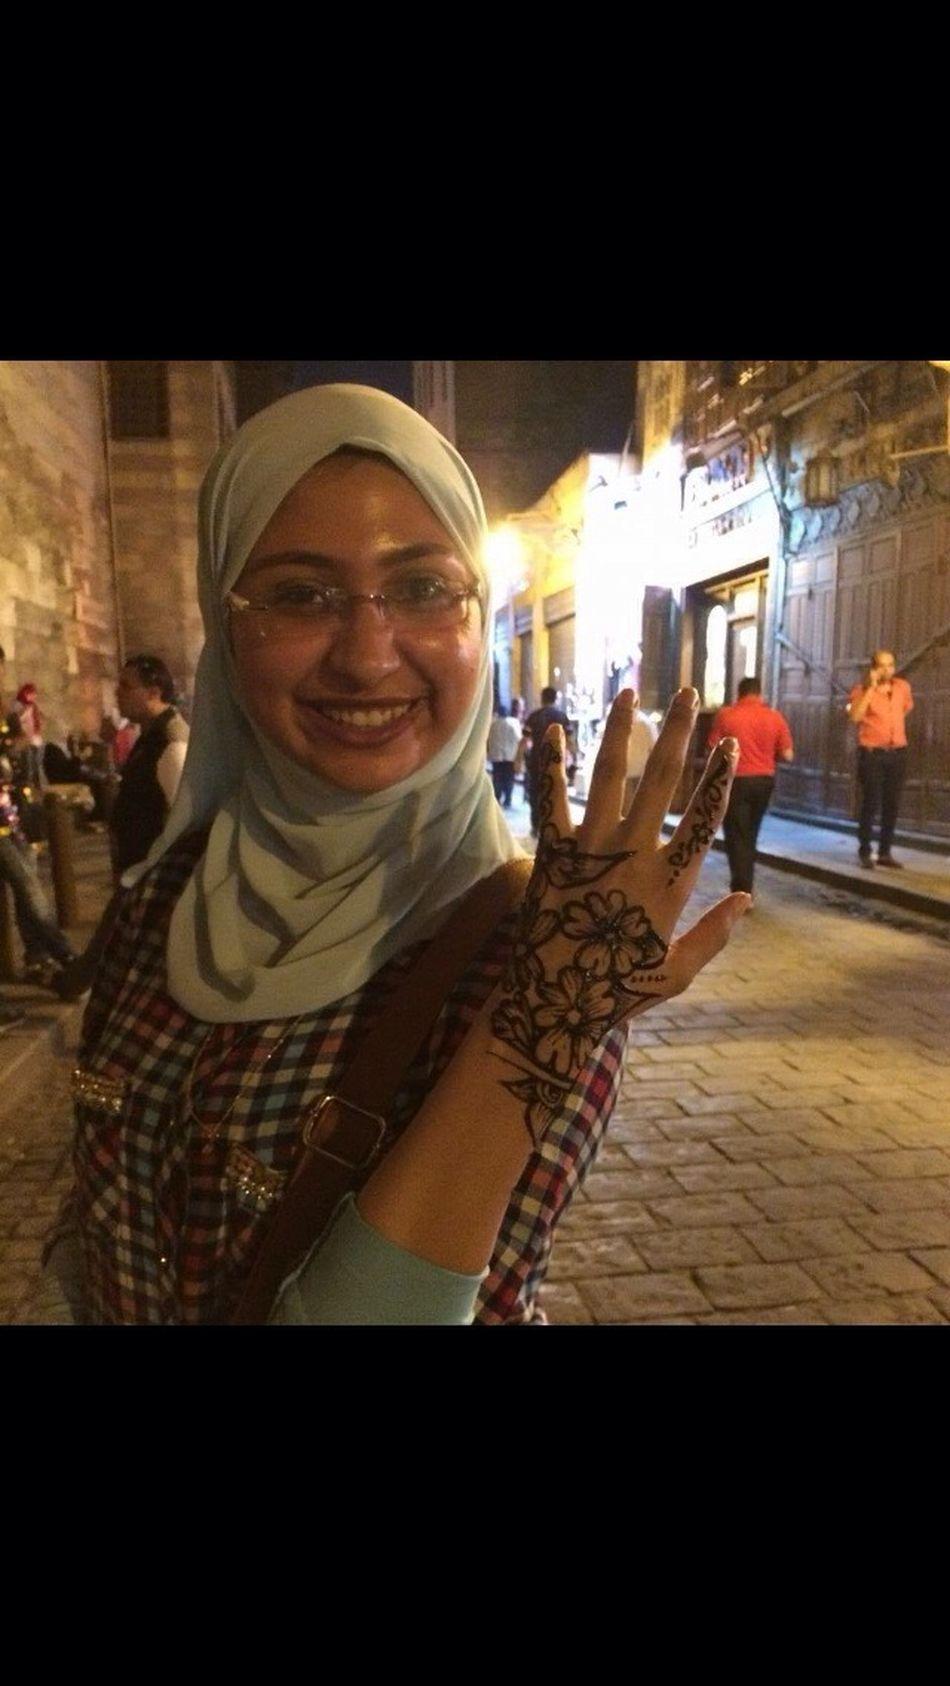 My Year My View Cairo Egypt Elmoezstreet Henna Tattoo ❤ Love Smile